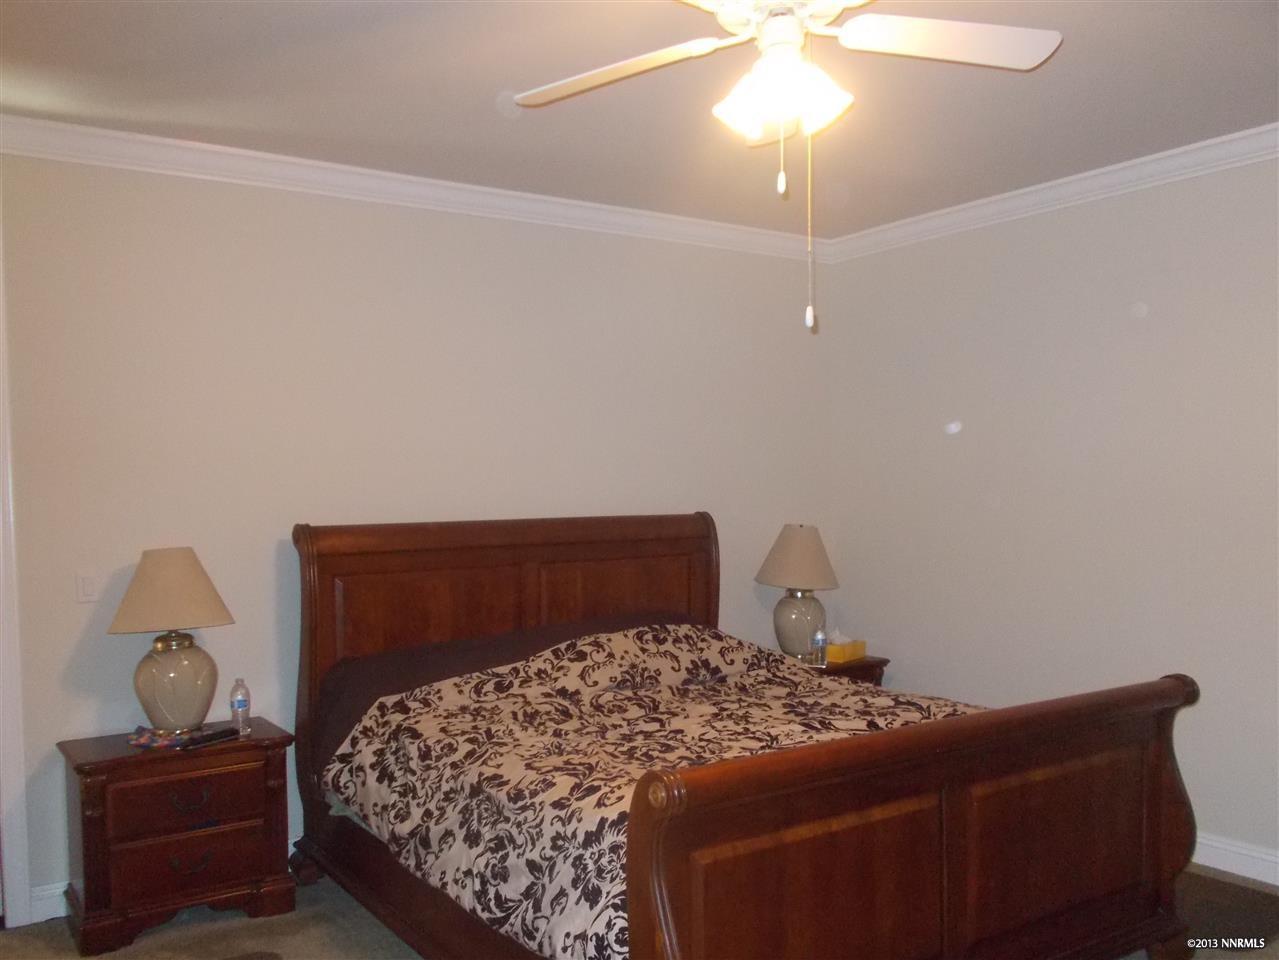 1181 Chisholm Trl, Gardnerville NV 89410